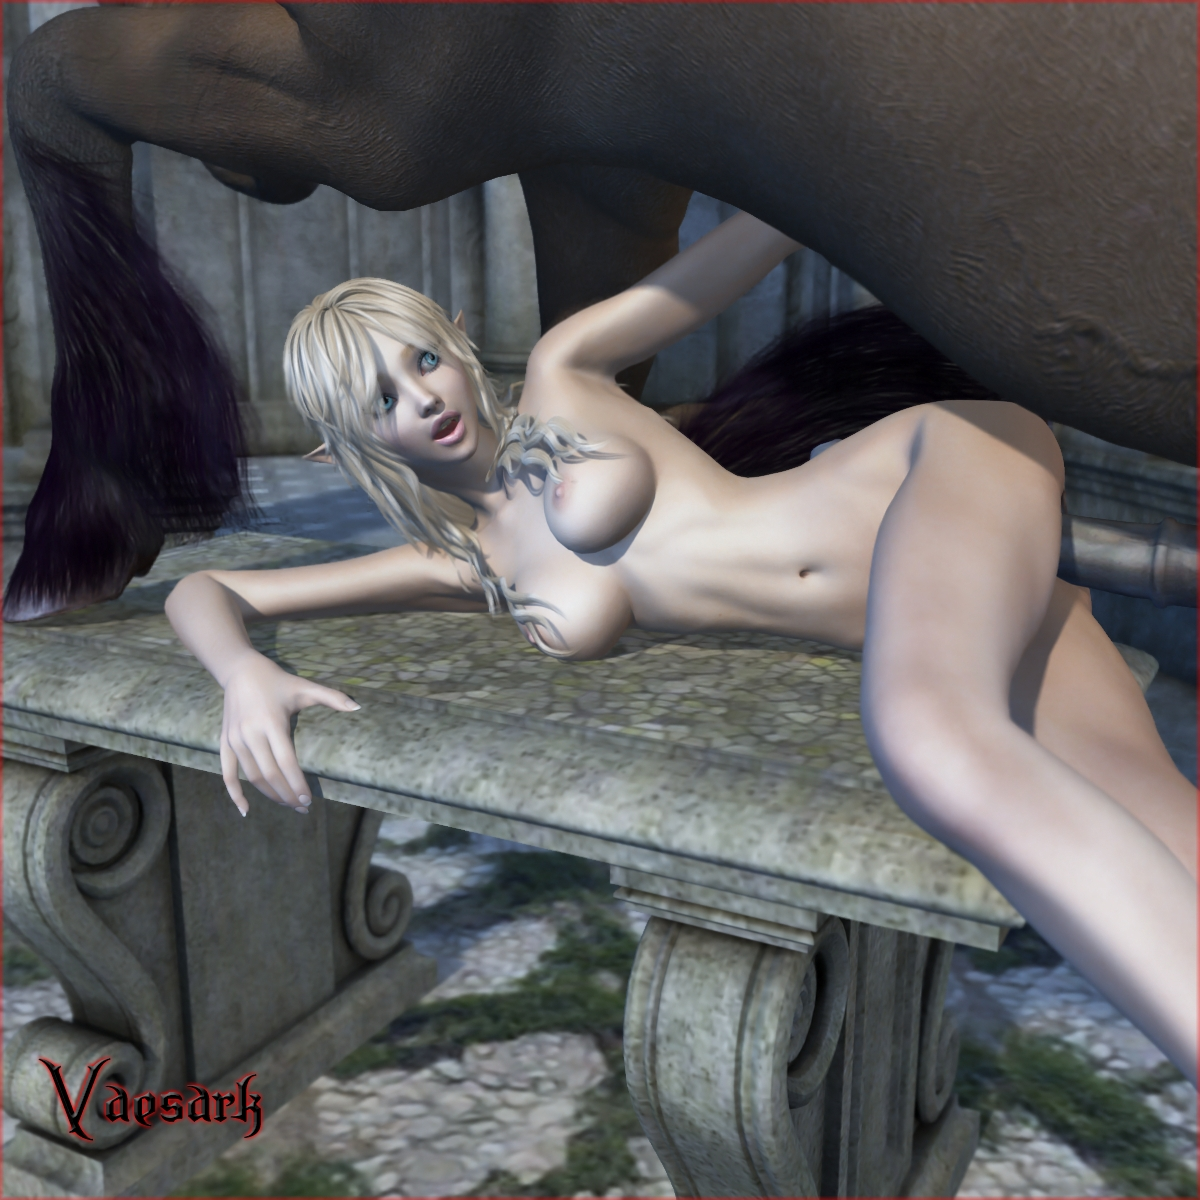 Unicorn and elf sex pron scene